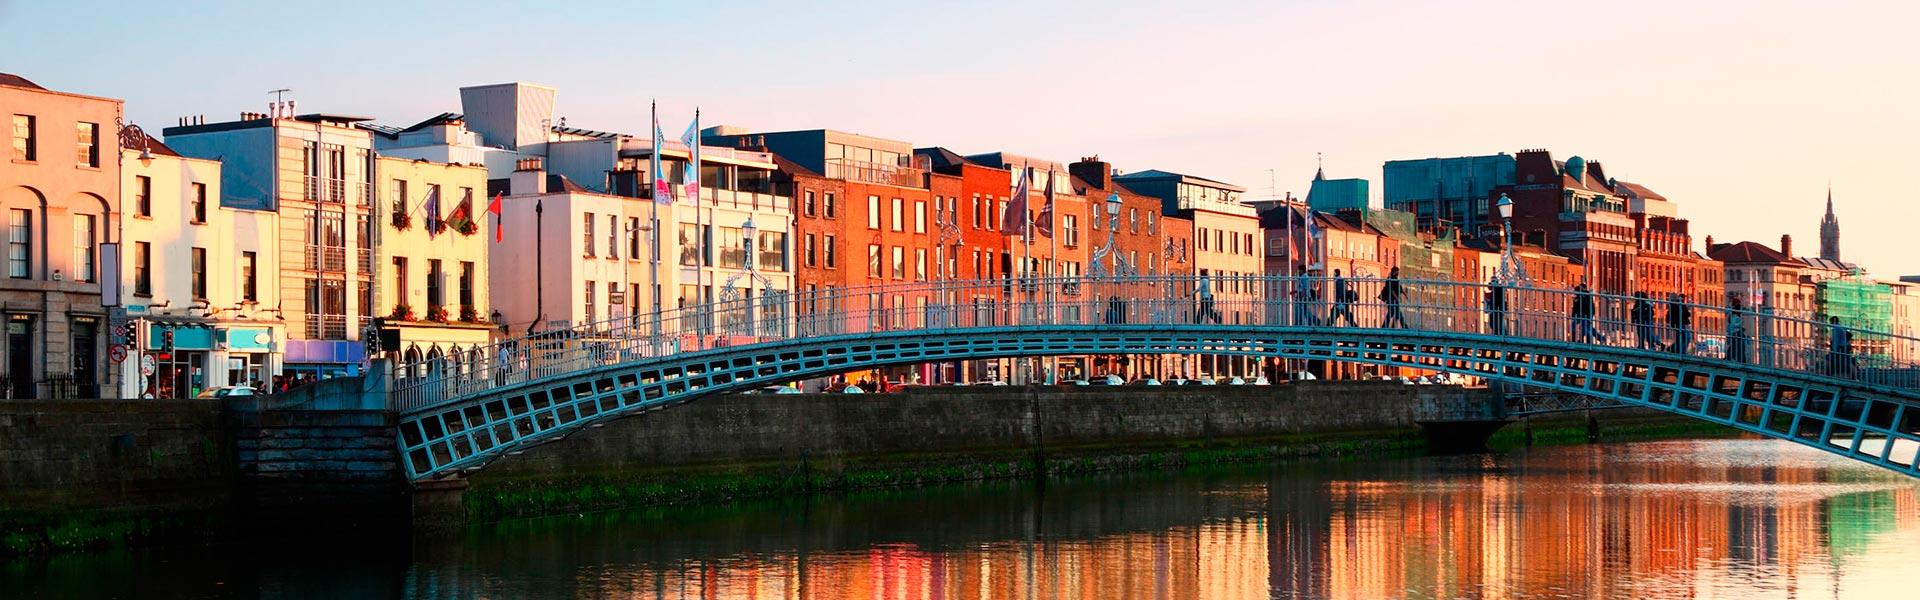 Cursos de inglés en Dublín Cursos de idiomas en el extranjero